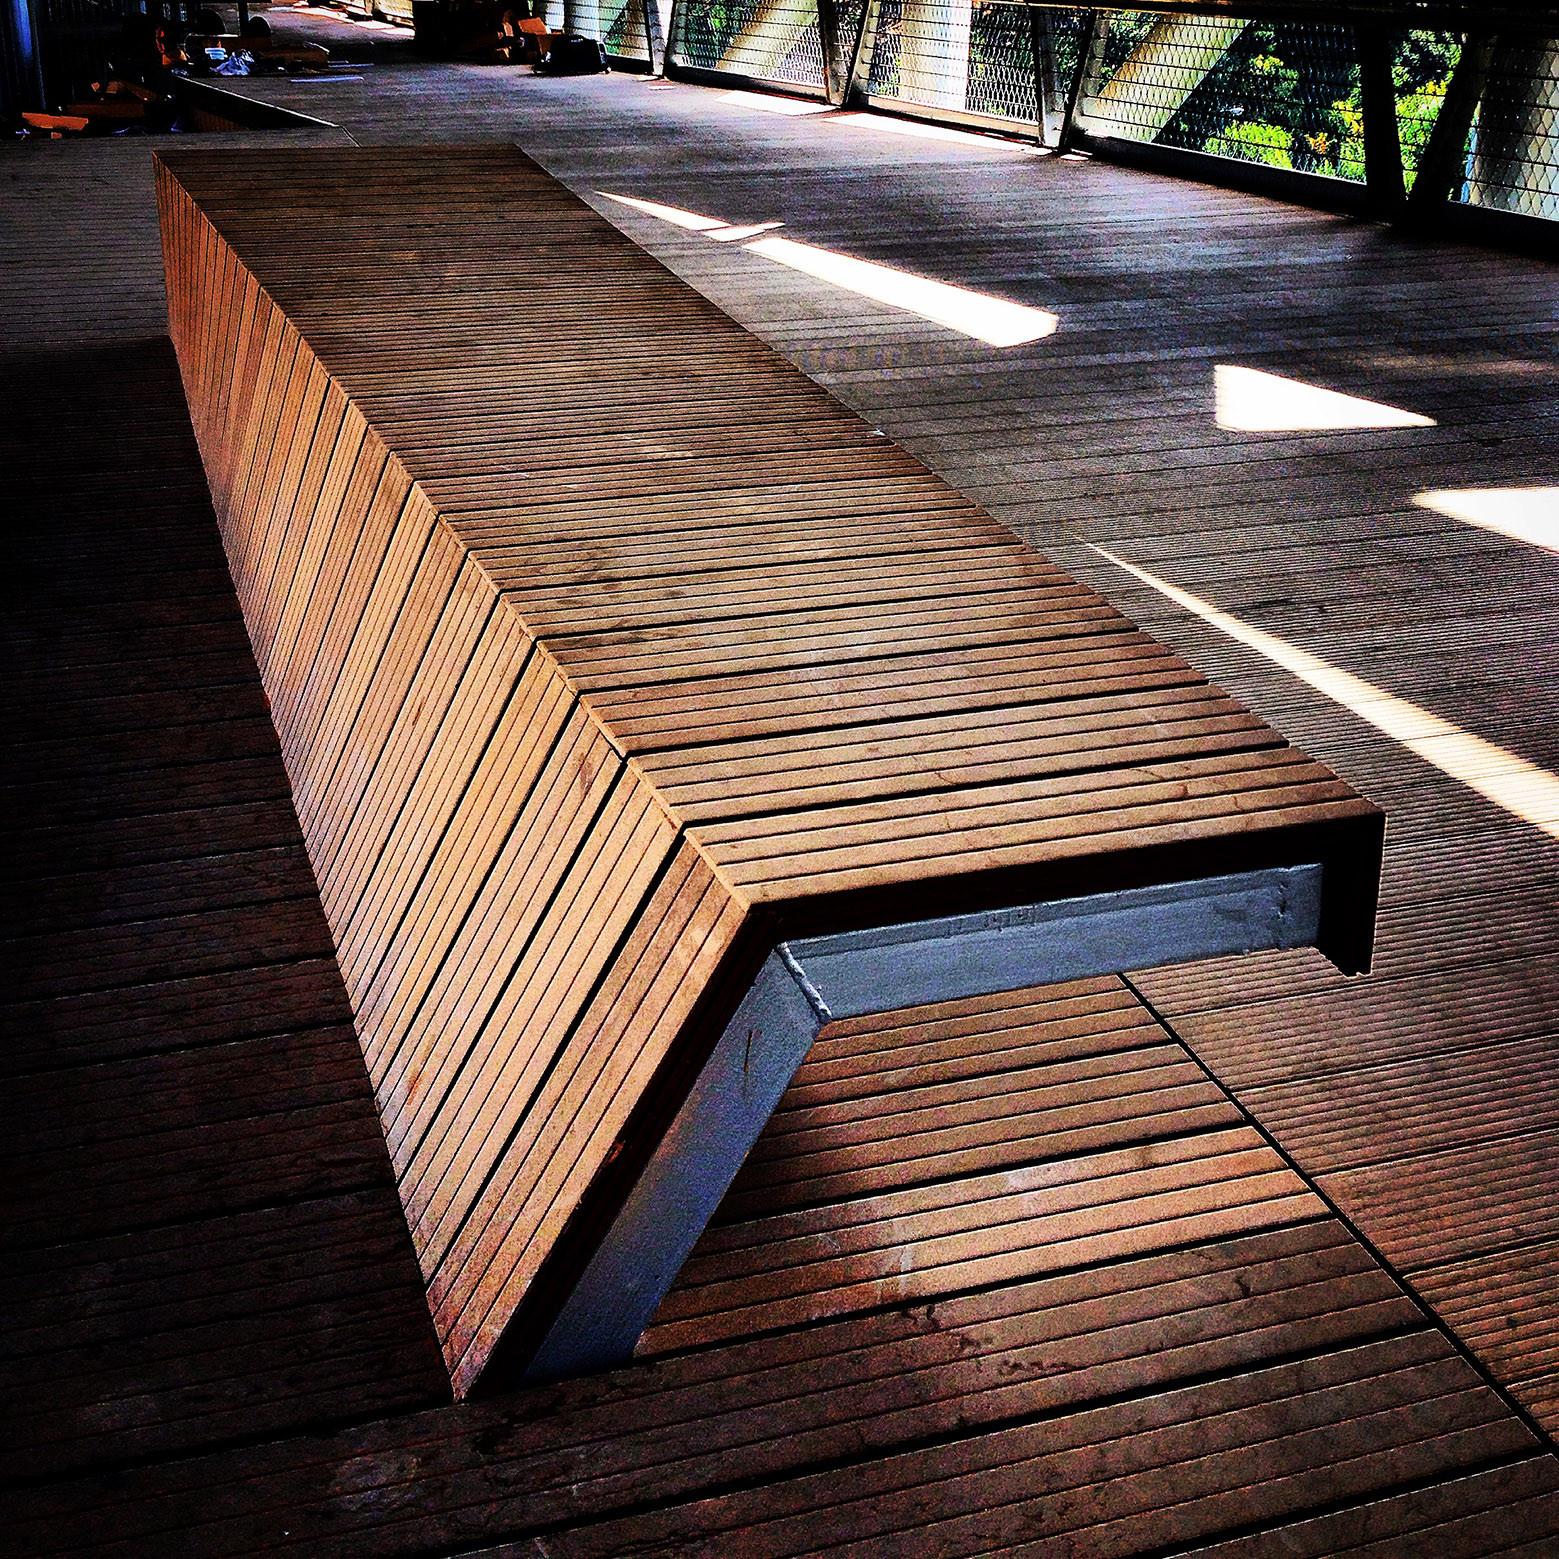 Gallery of Tabiat Pedestrian Bridge / Diba Tensile ...